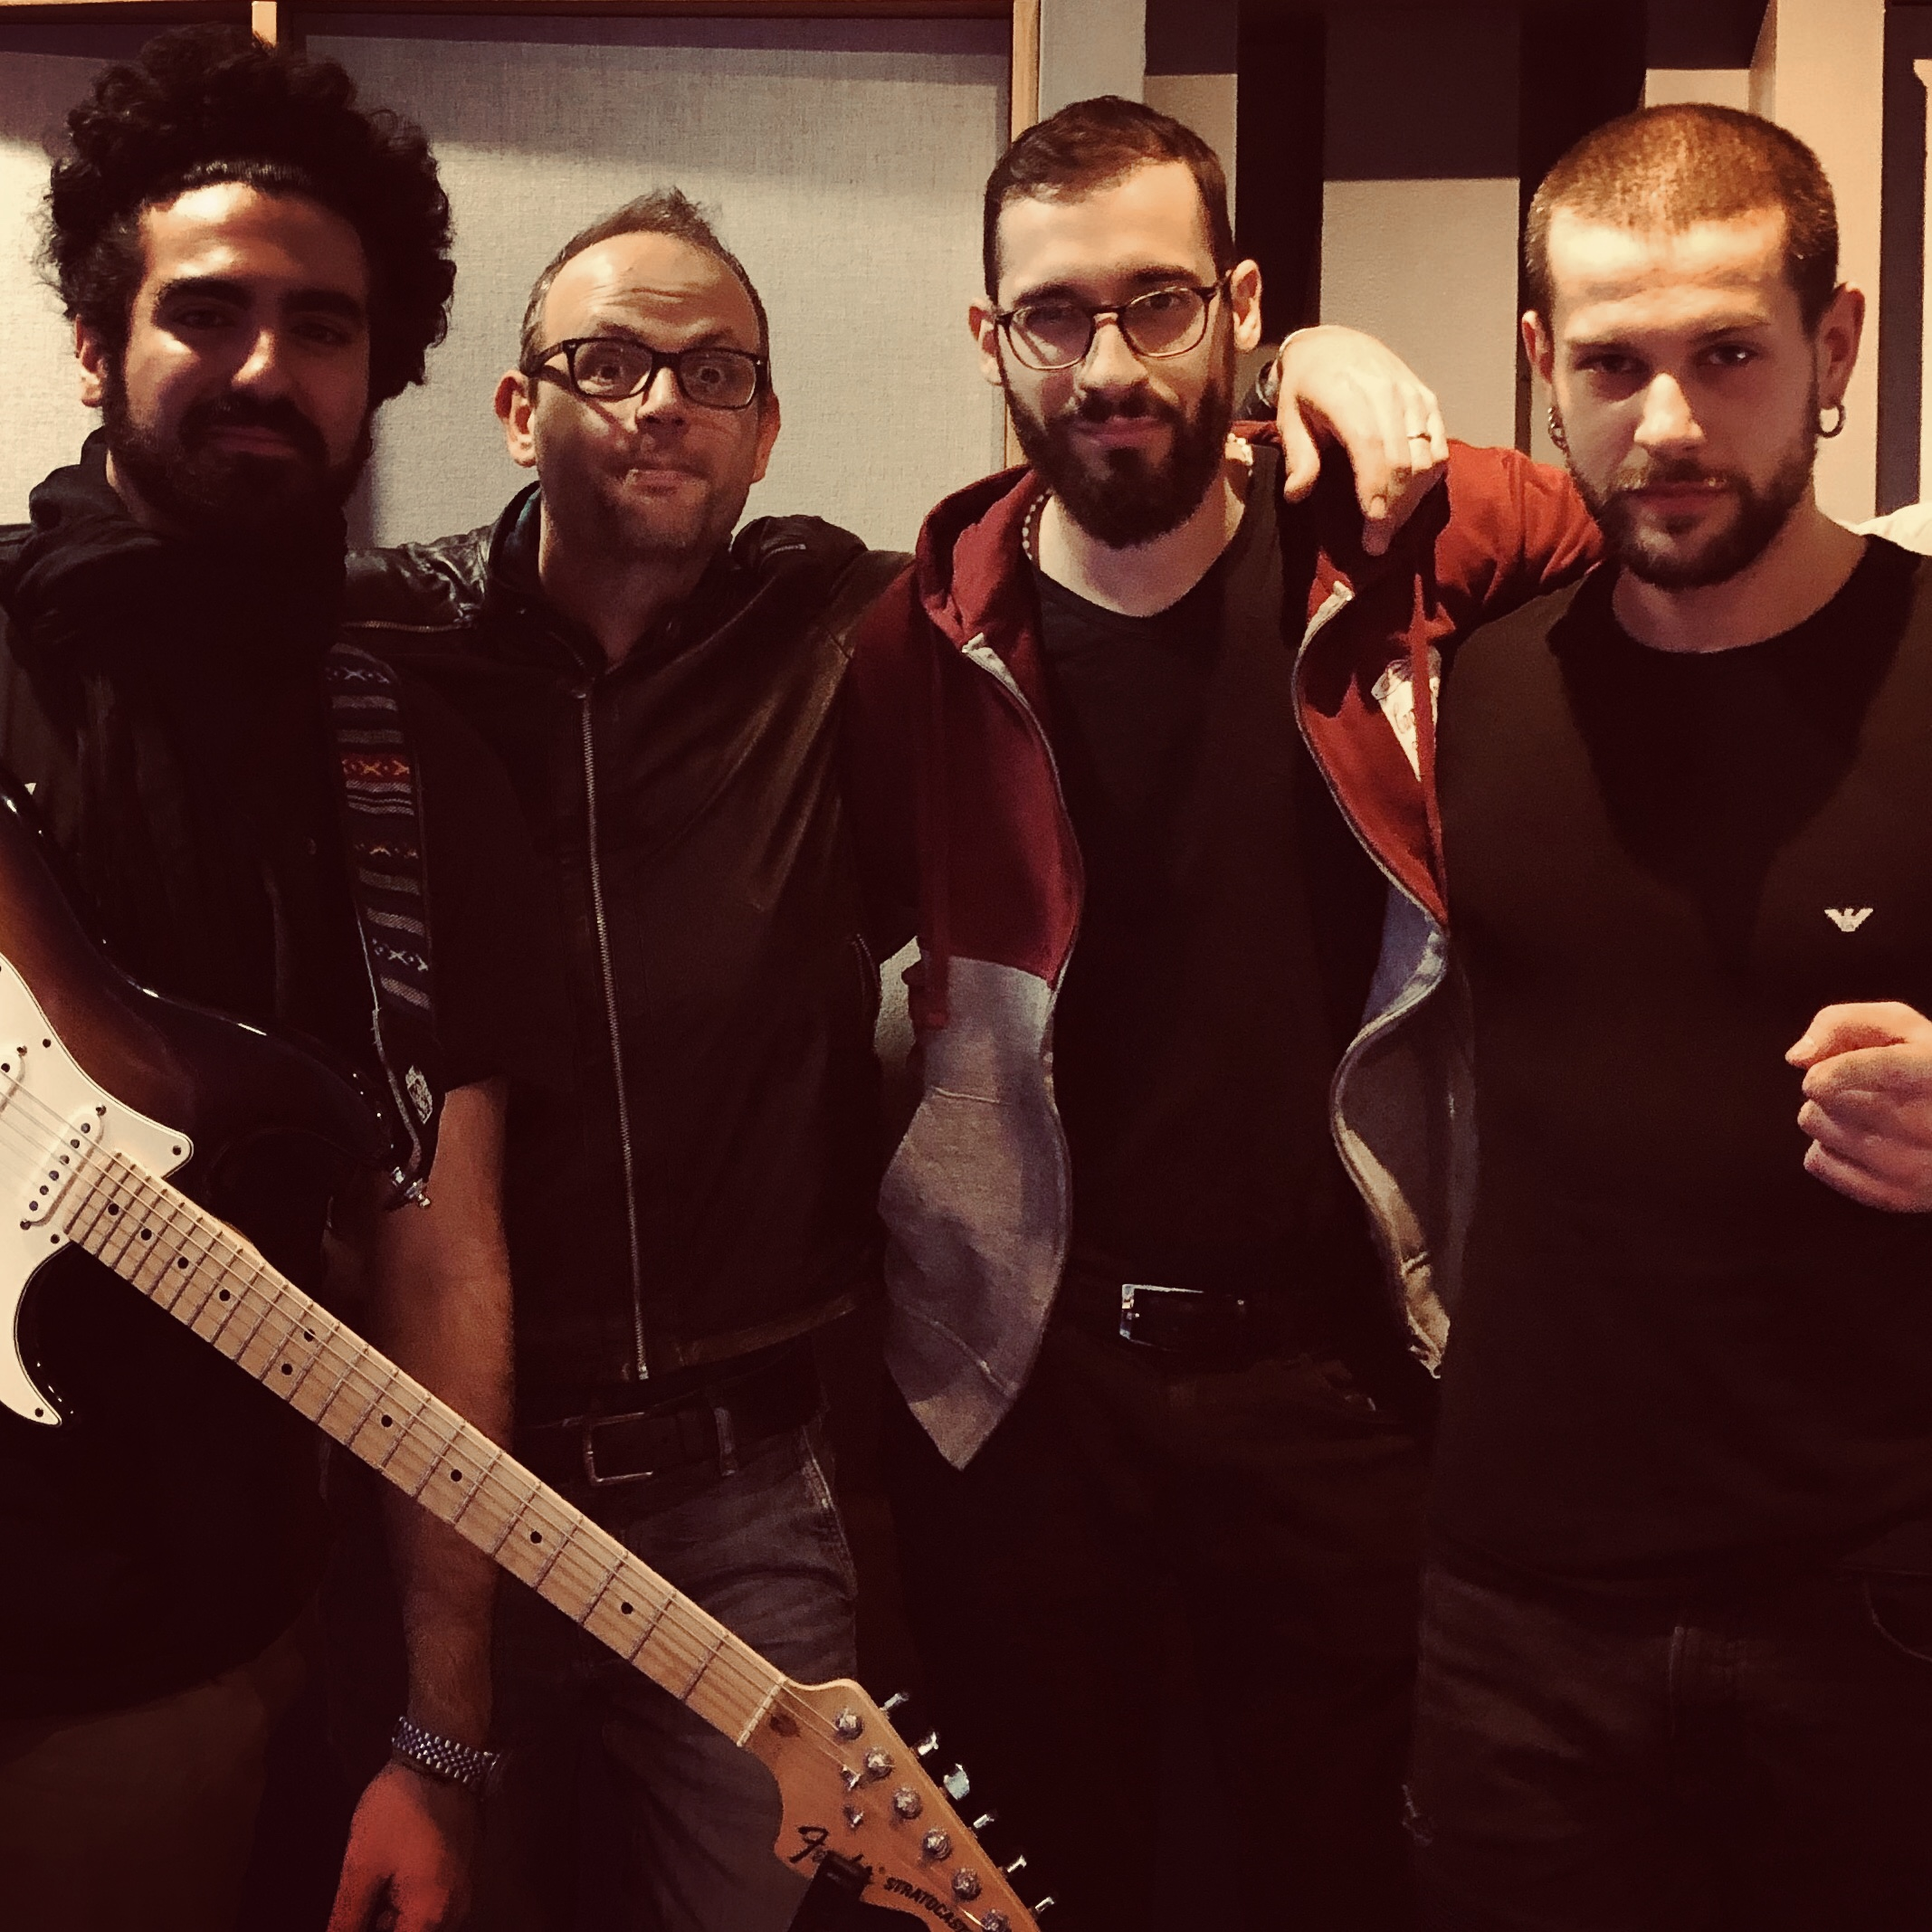 Luciano Macchia crooner band